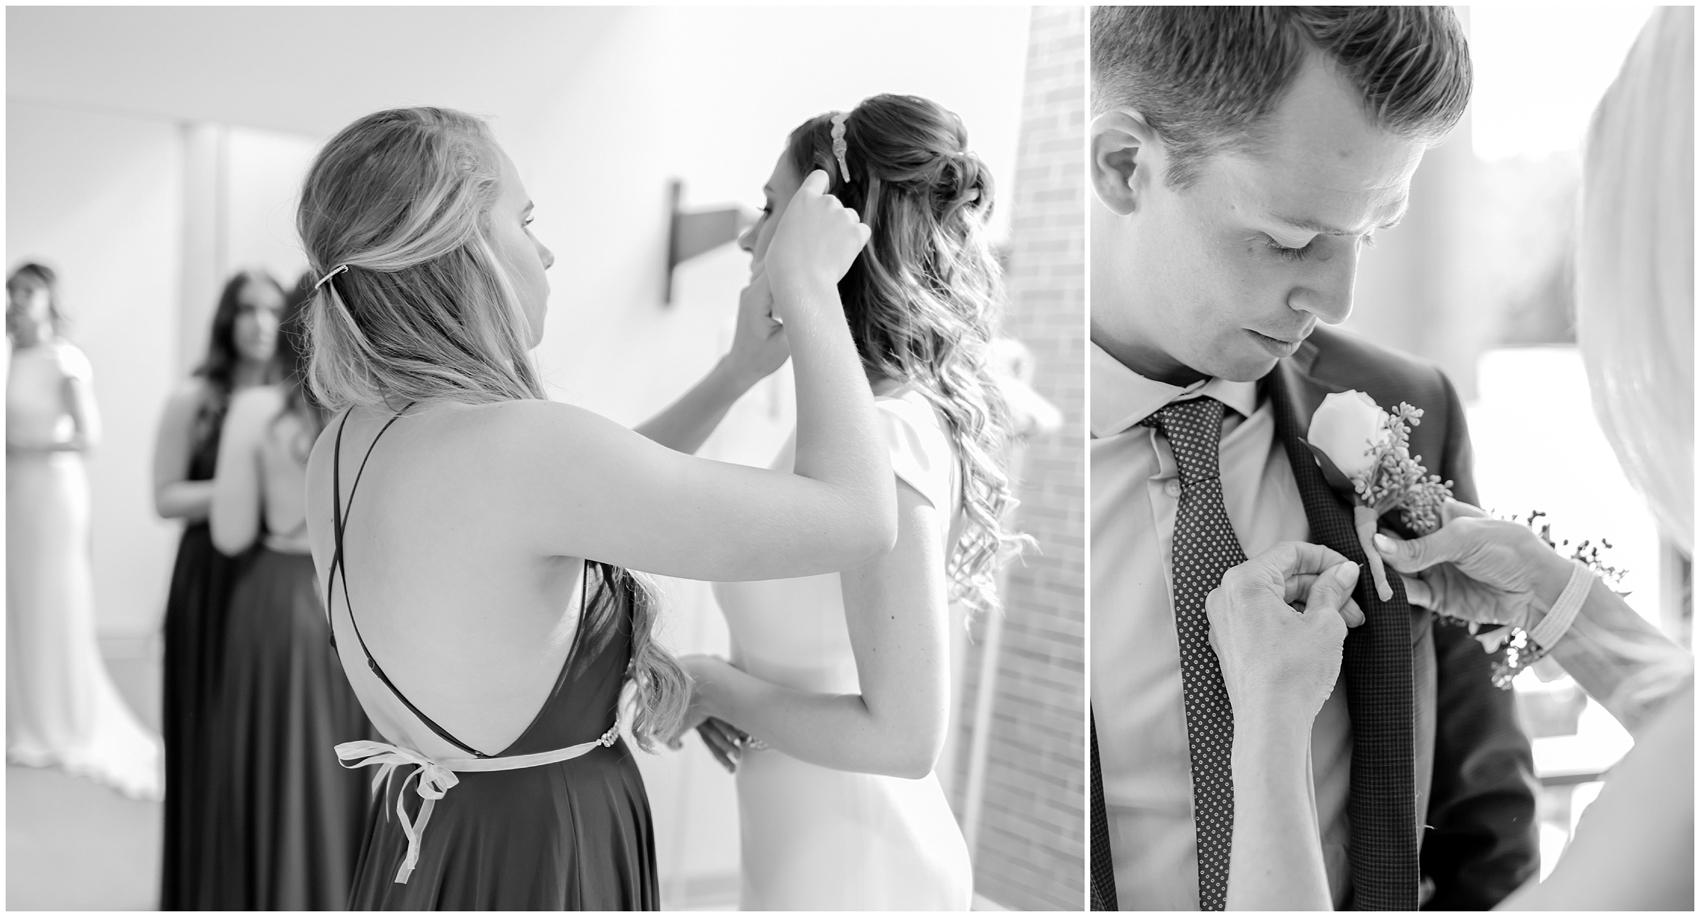 ritz-carlton-georgetown-wedding-washington-dc-photography-liz-stewart-photo-00011